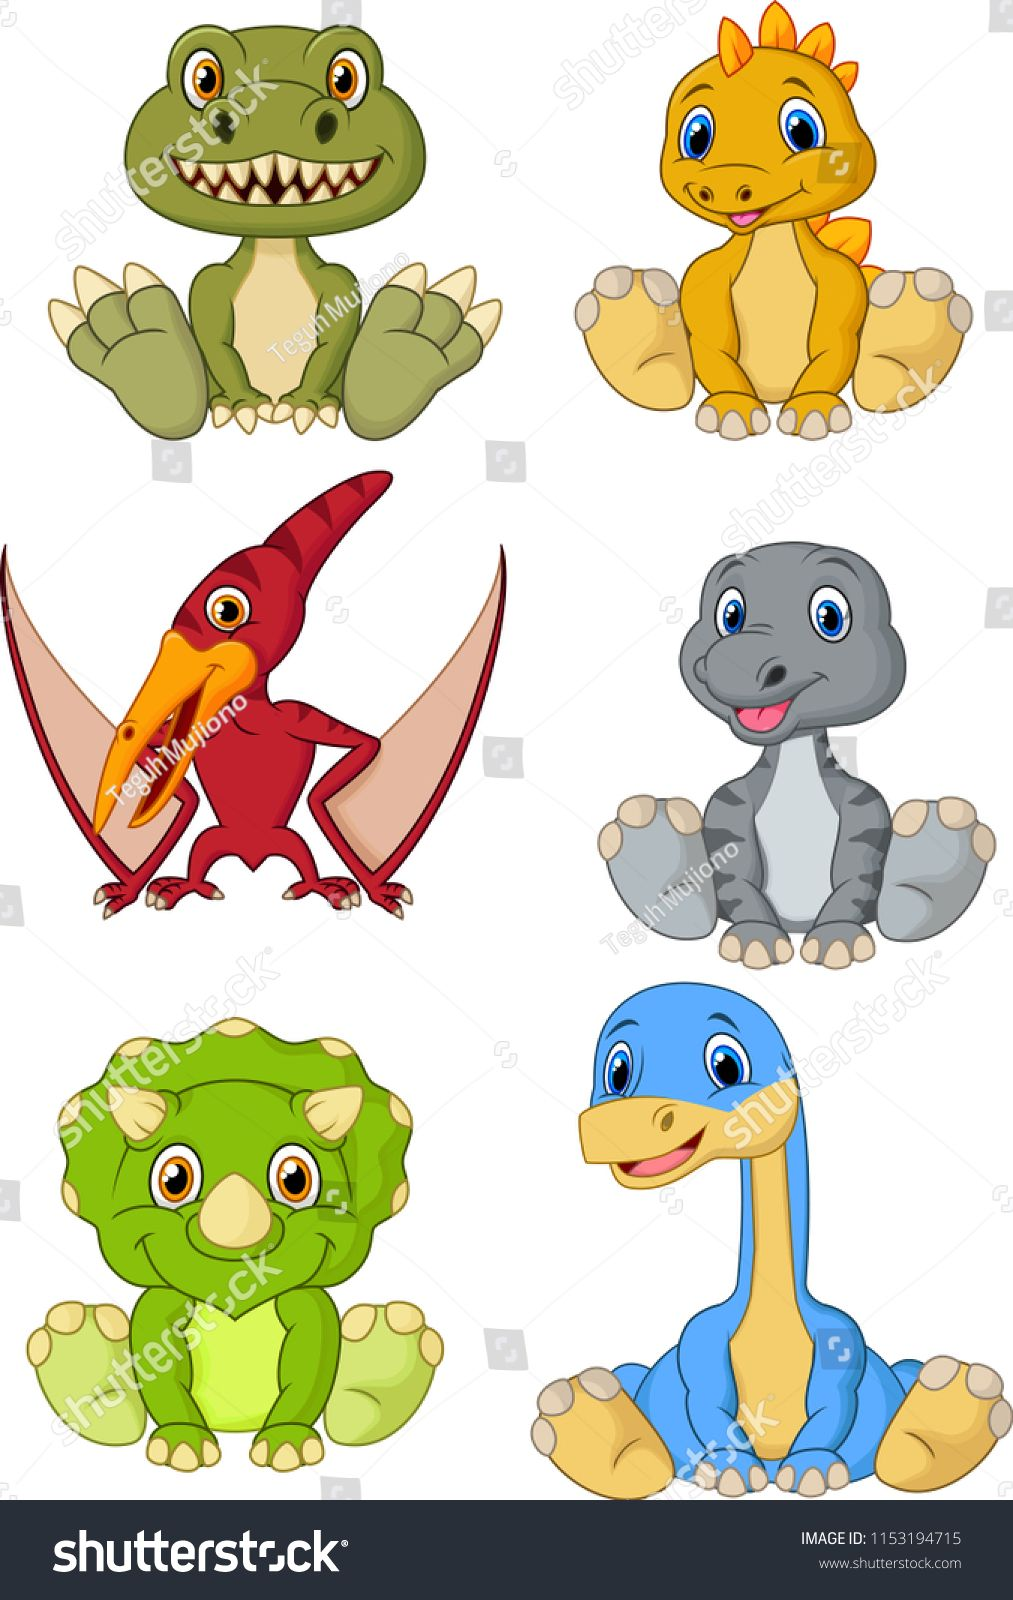 Cute Baby Dinosaurs Cartoon Collection Setdinosaurs Baby Cute Set